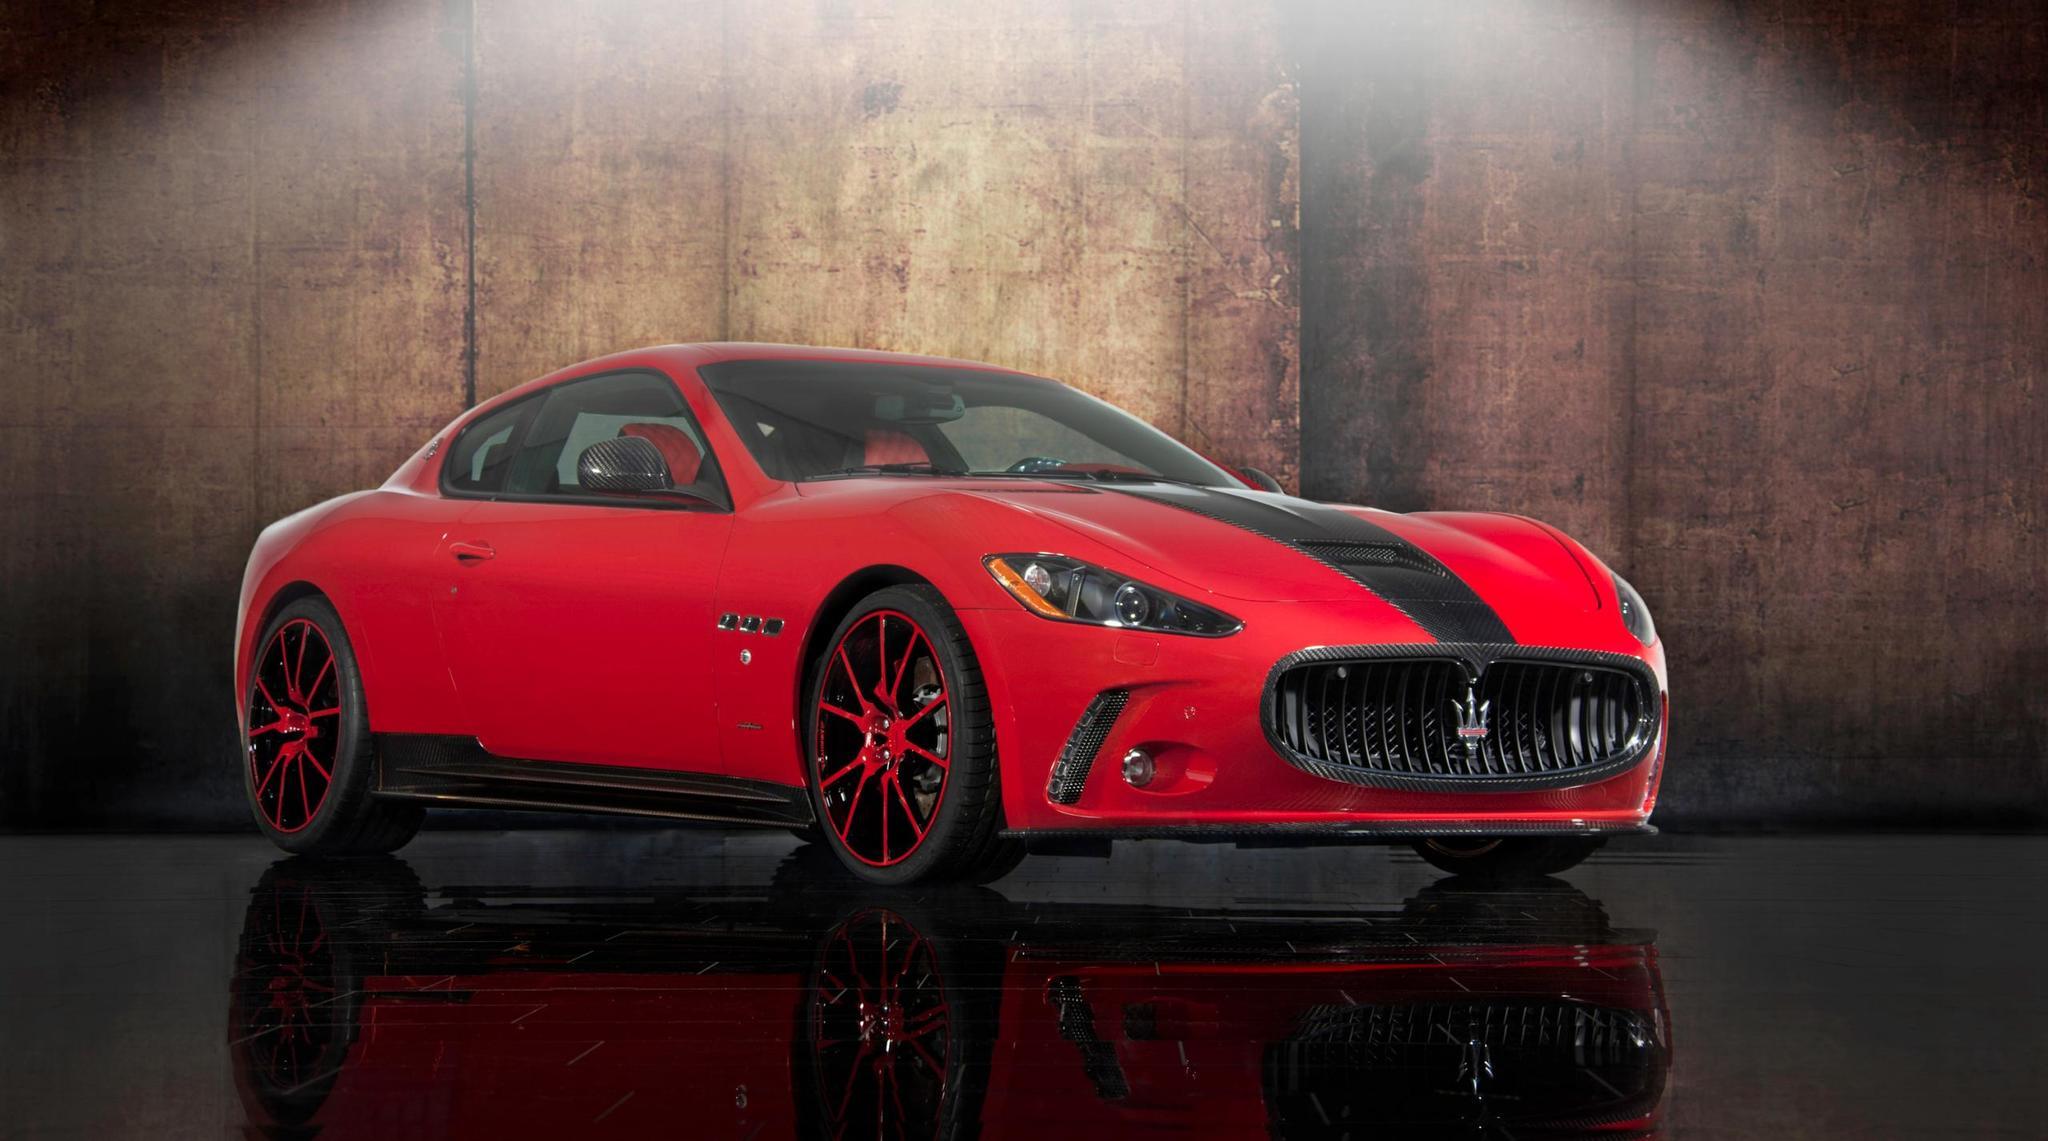 Mansory body kit for Maserati Gran Turismo new style